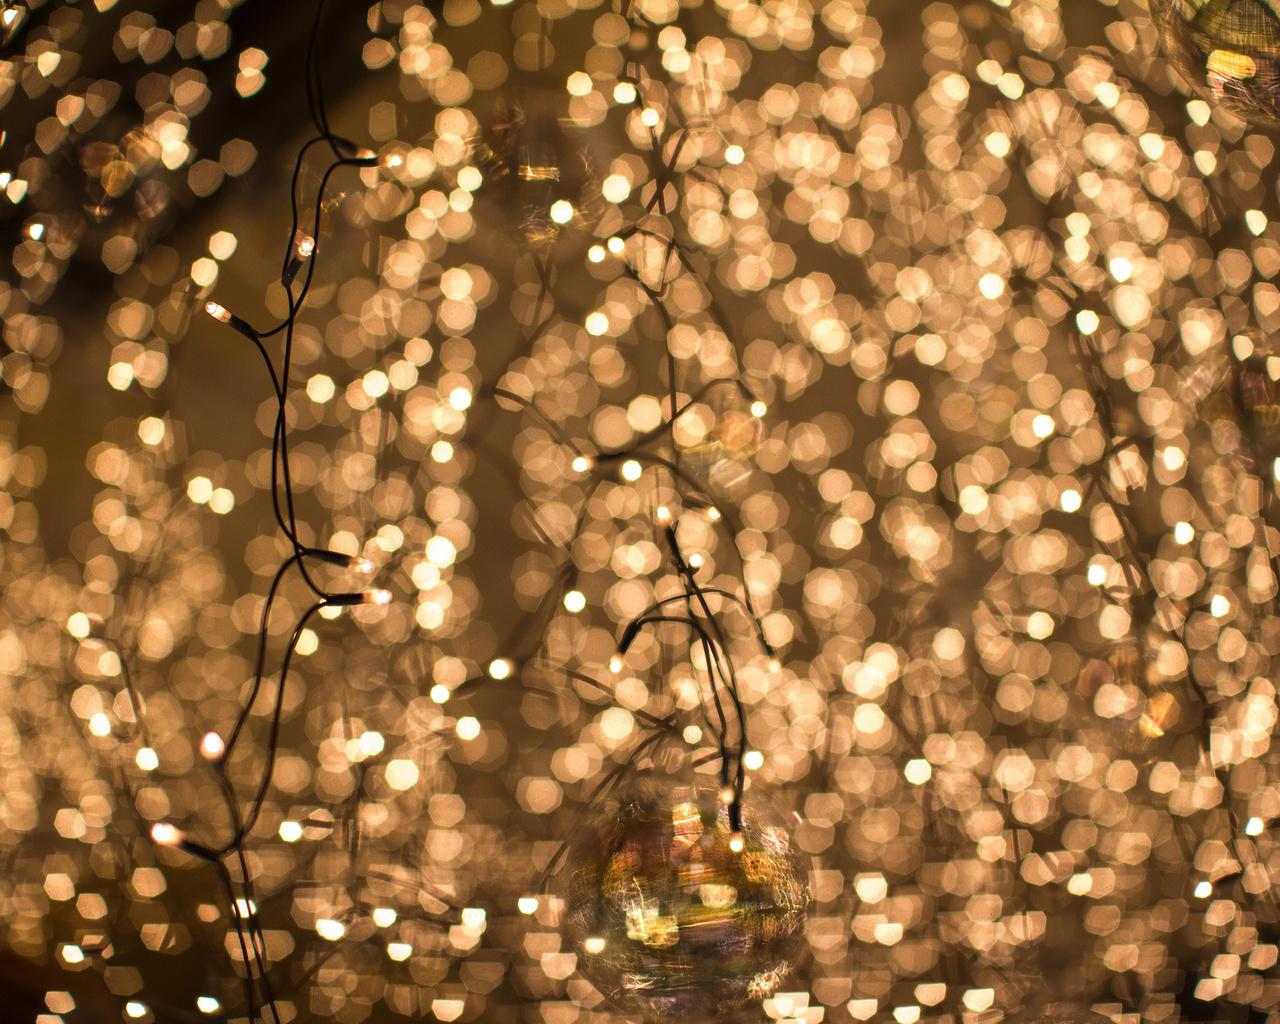 Гирлянда, шары, размытость, огни, боке, желтые